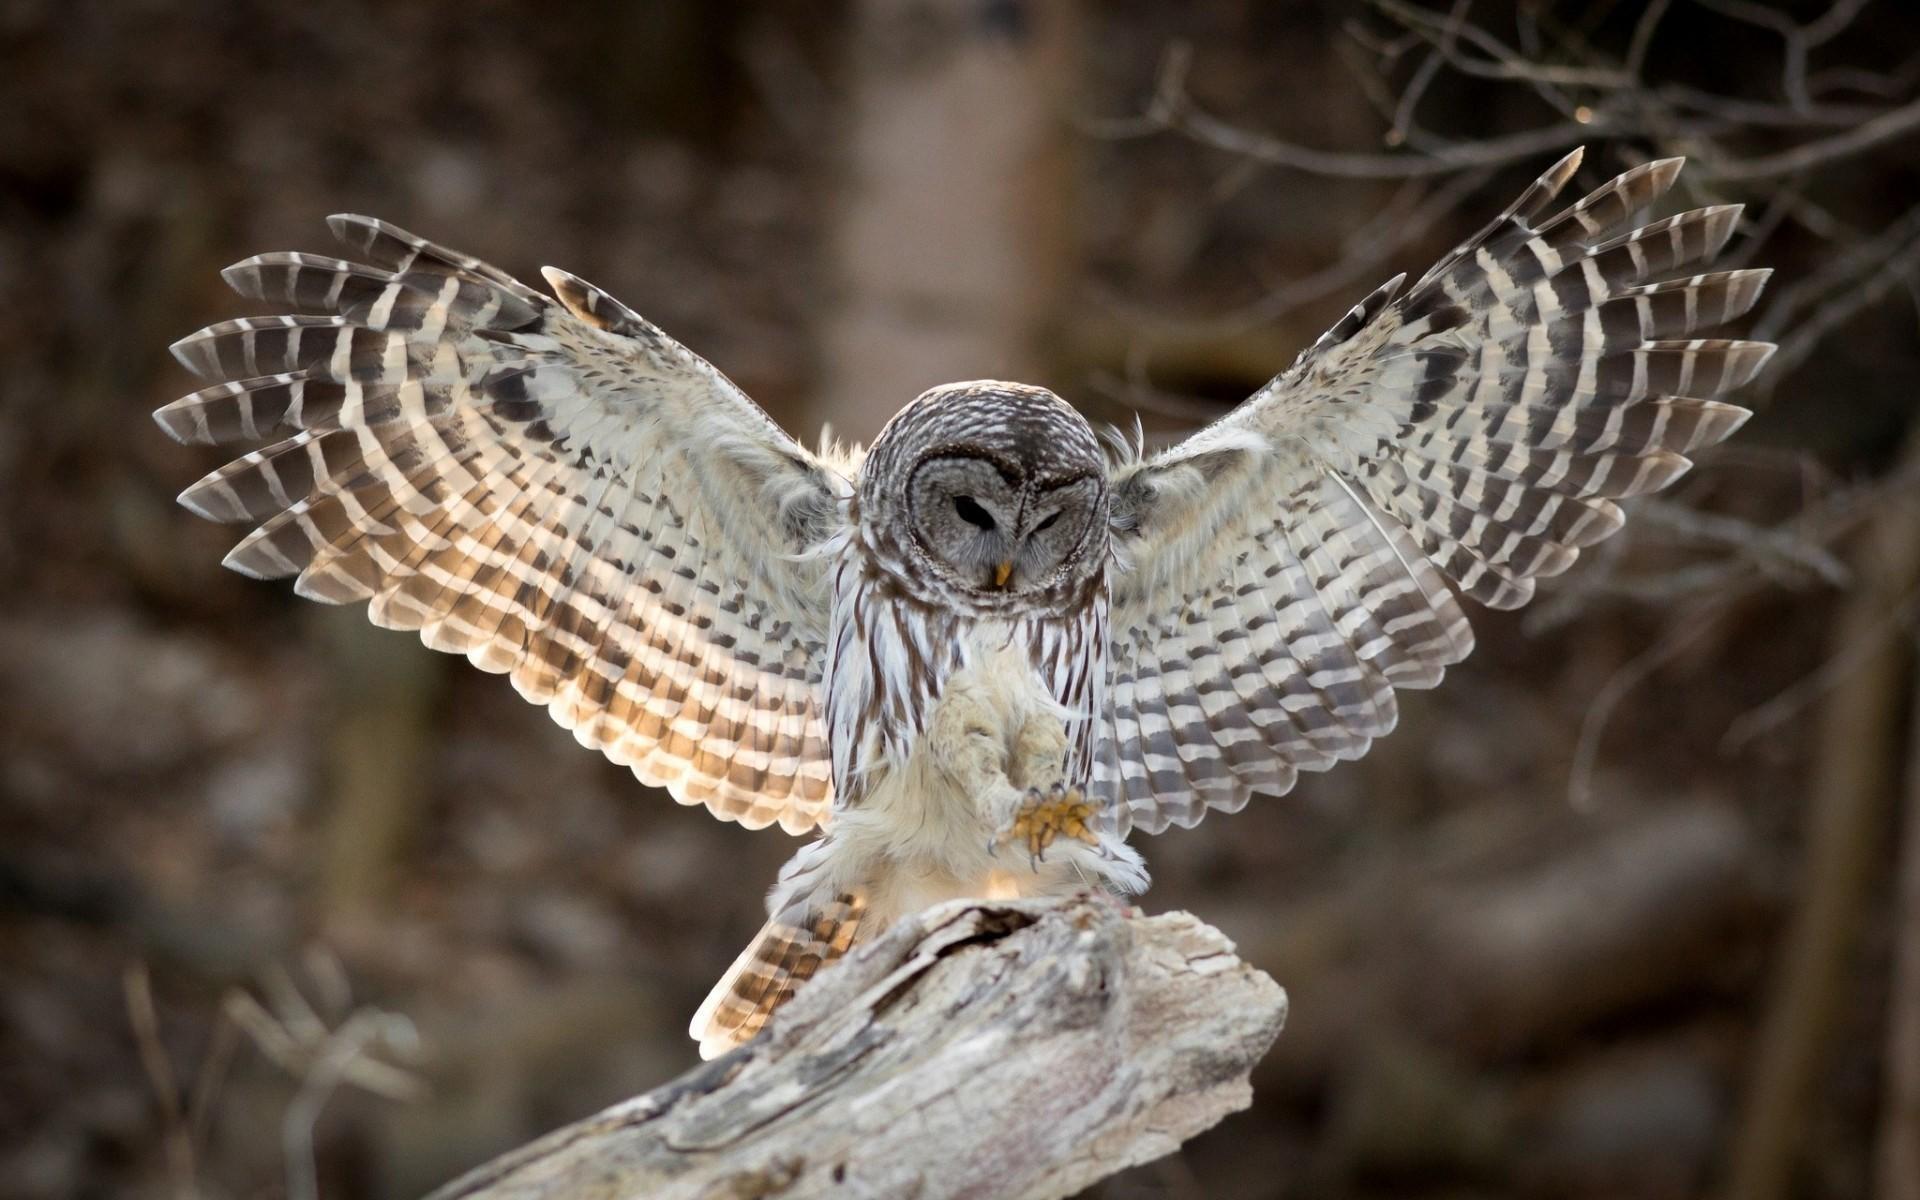 Res: 1920x1200, Owl wings